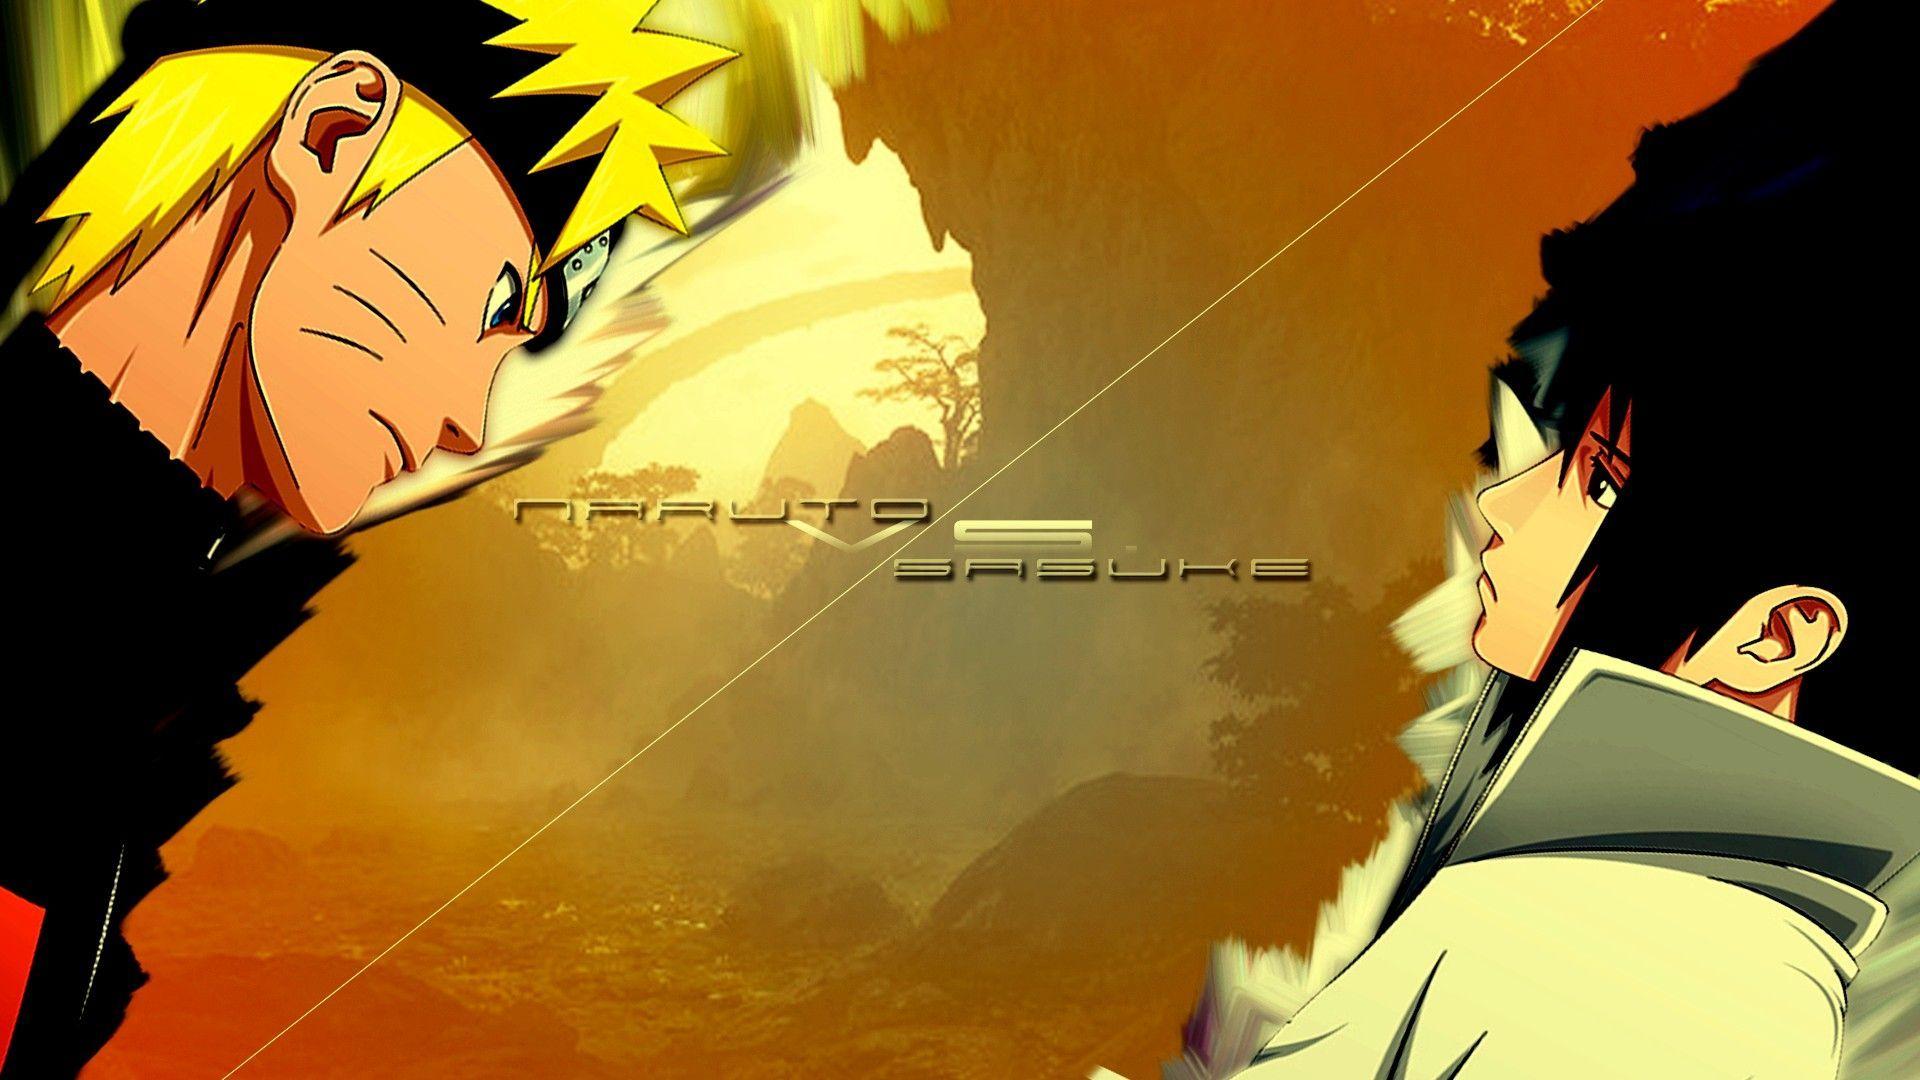 Unduh 66 Wallpaper Naruto Powerpoint Terbaik